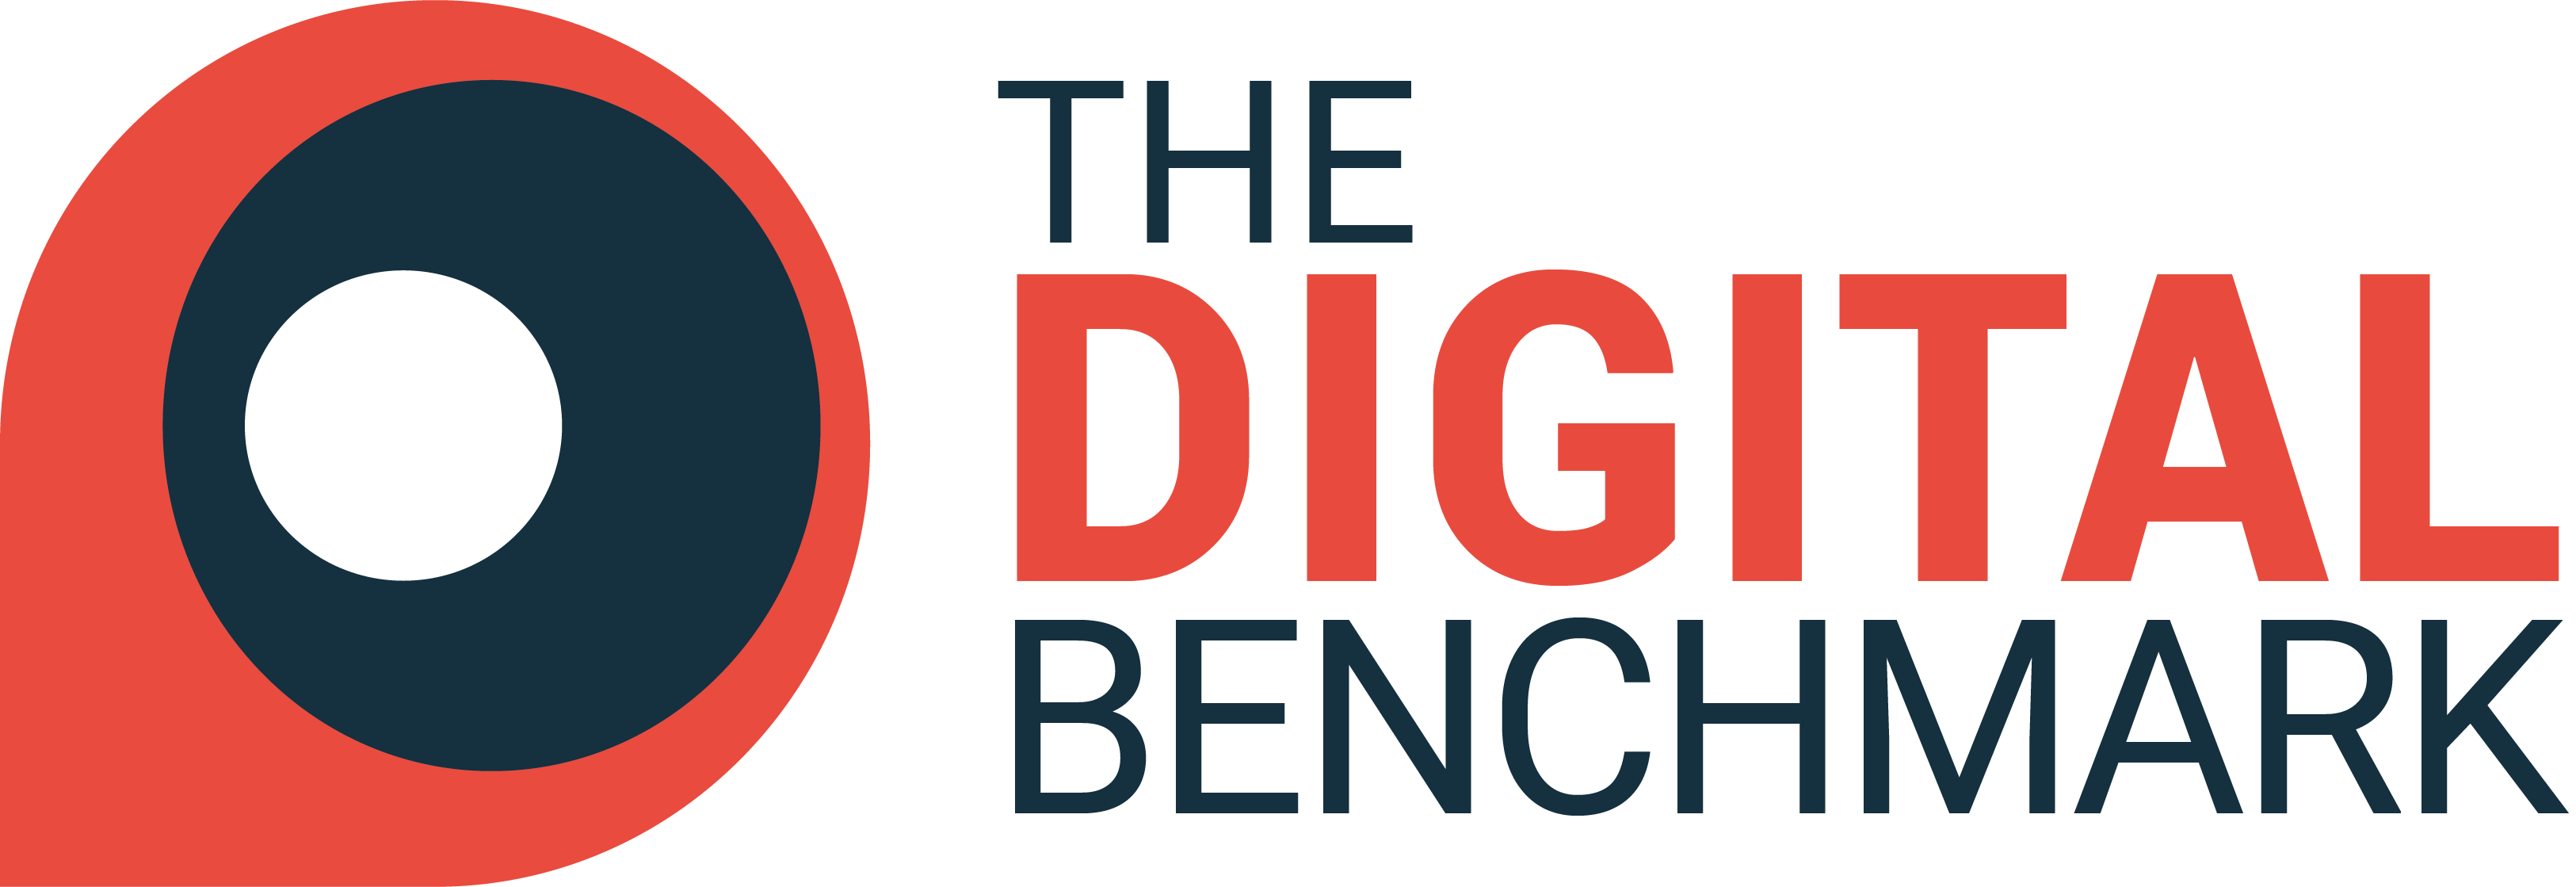 Amsterdam 2021 - The Digital Benchmark - EBG